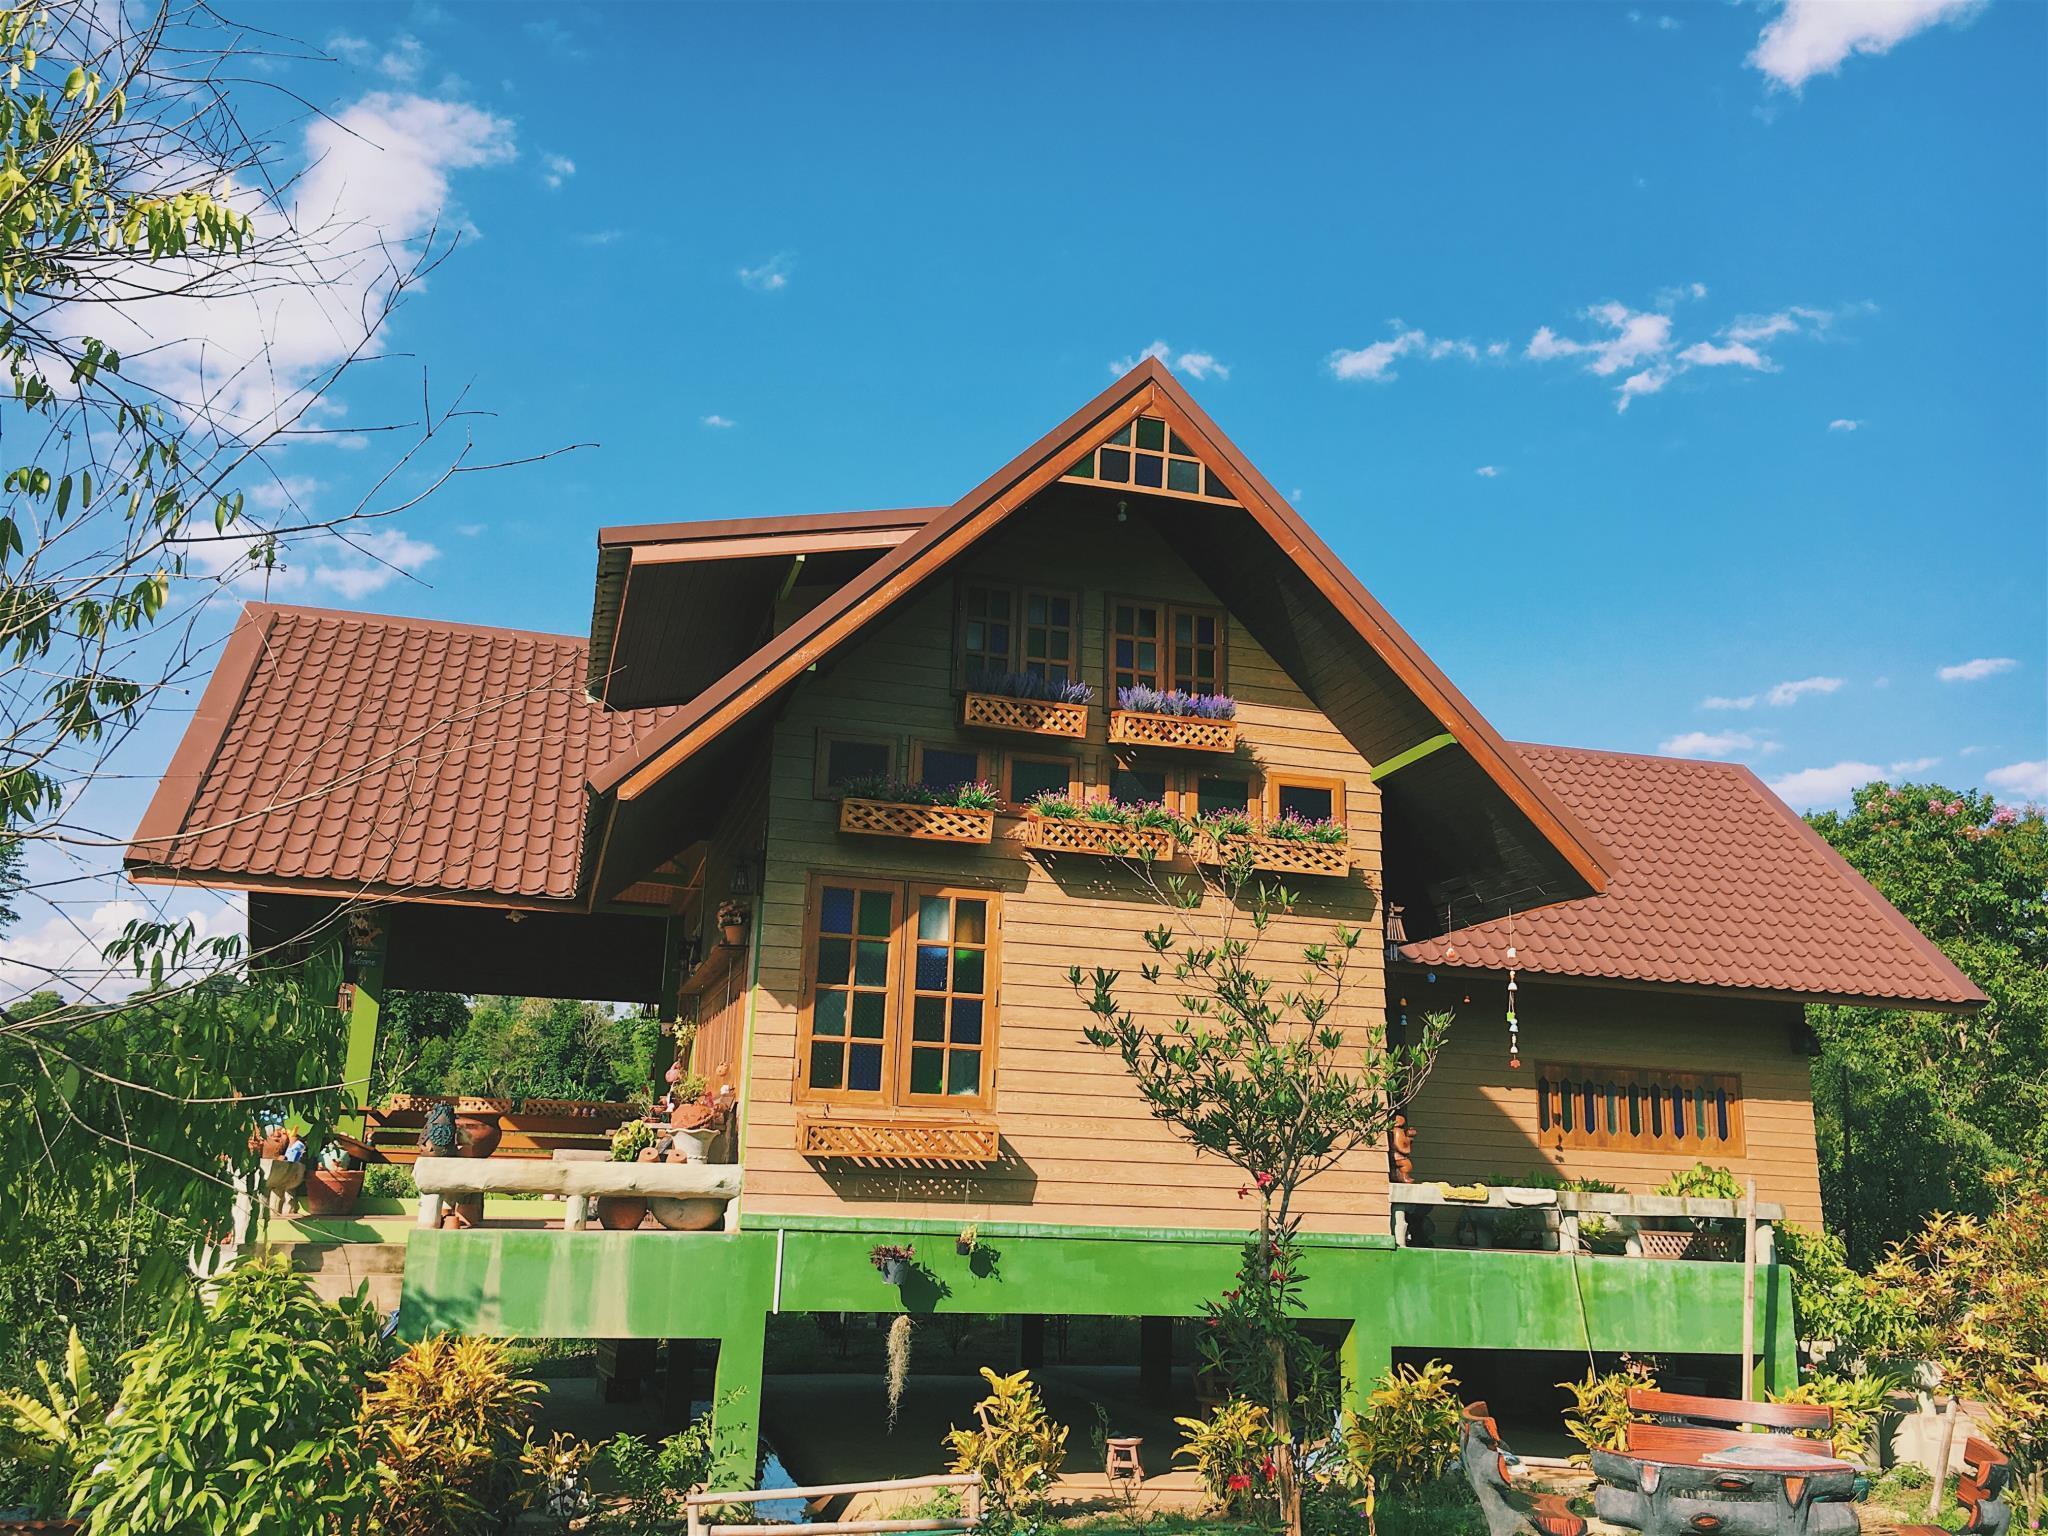 Mon Phum Tawan Chiangmai,Mon Phum Tawan Chiangmai